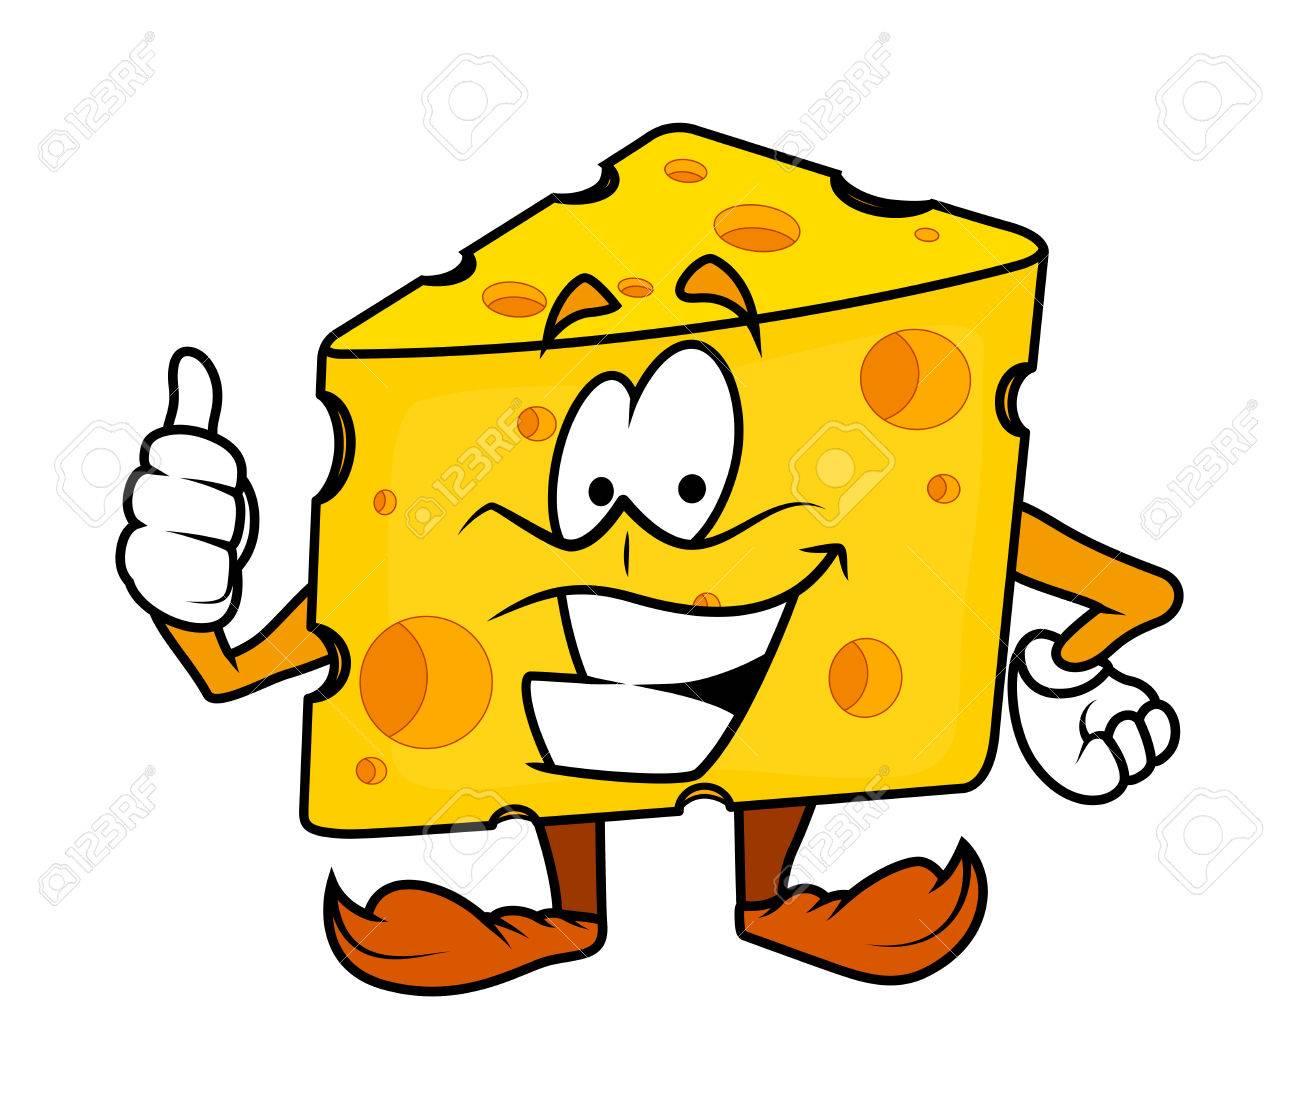 Motivating Cartoon Cheese Vector Royalty Free Cliparts Vectors And Stock Illustration Image 42025659